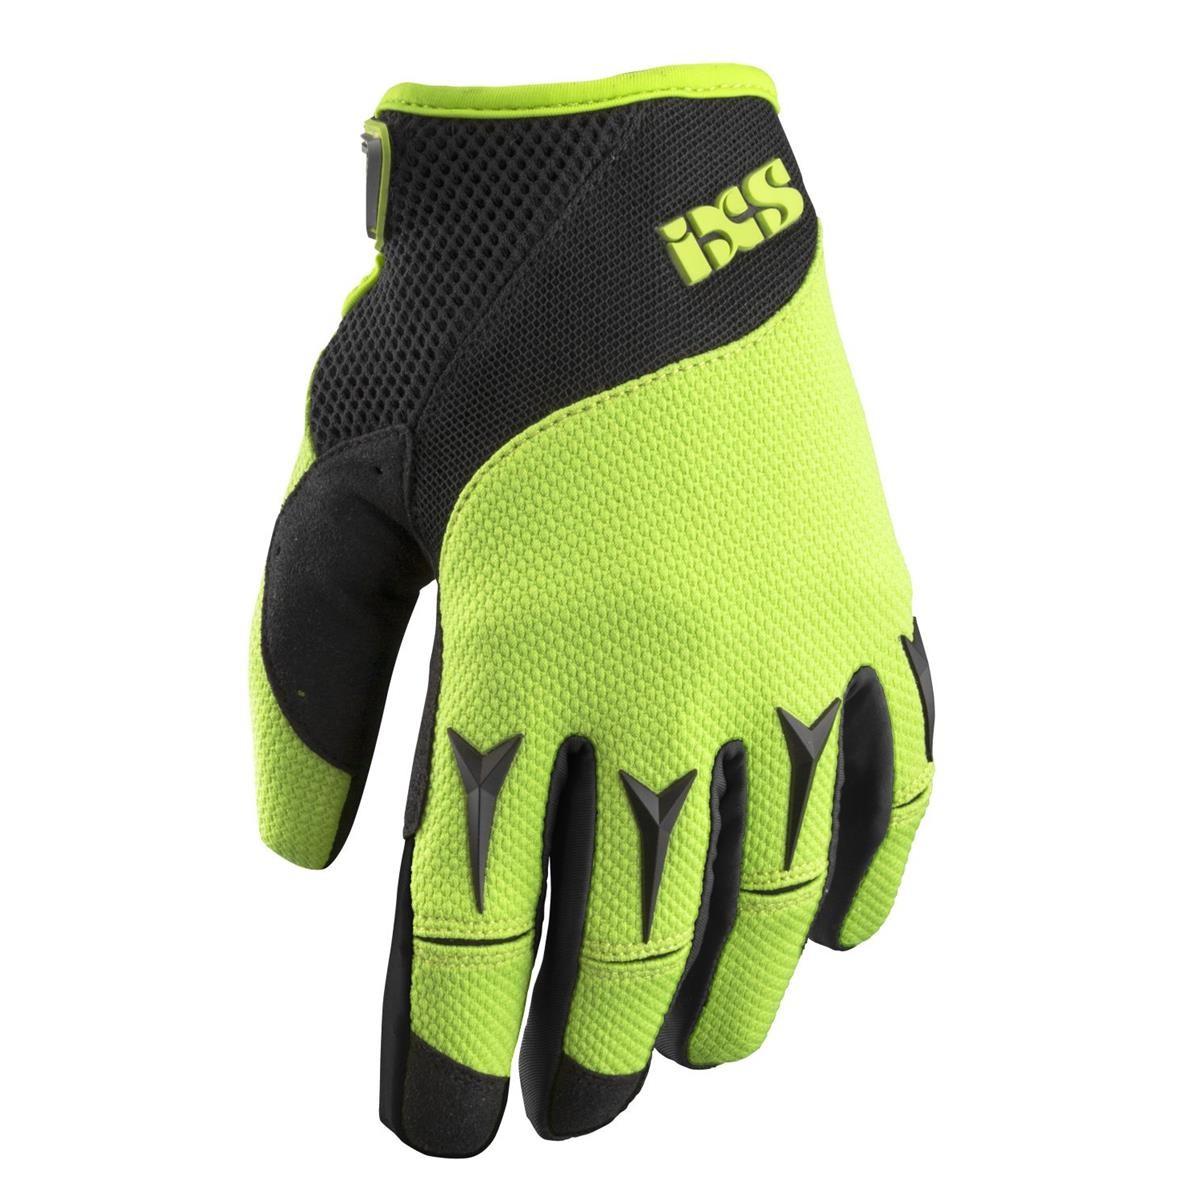 IXS Downhill-Handschuhe BC-X2.2, S, Grün